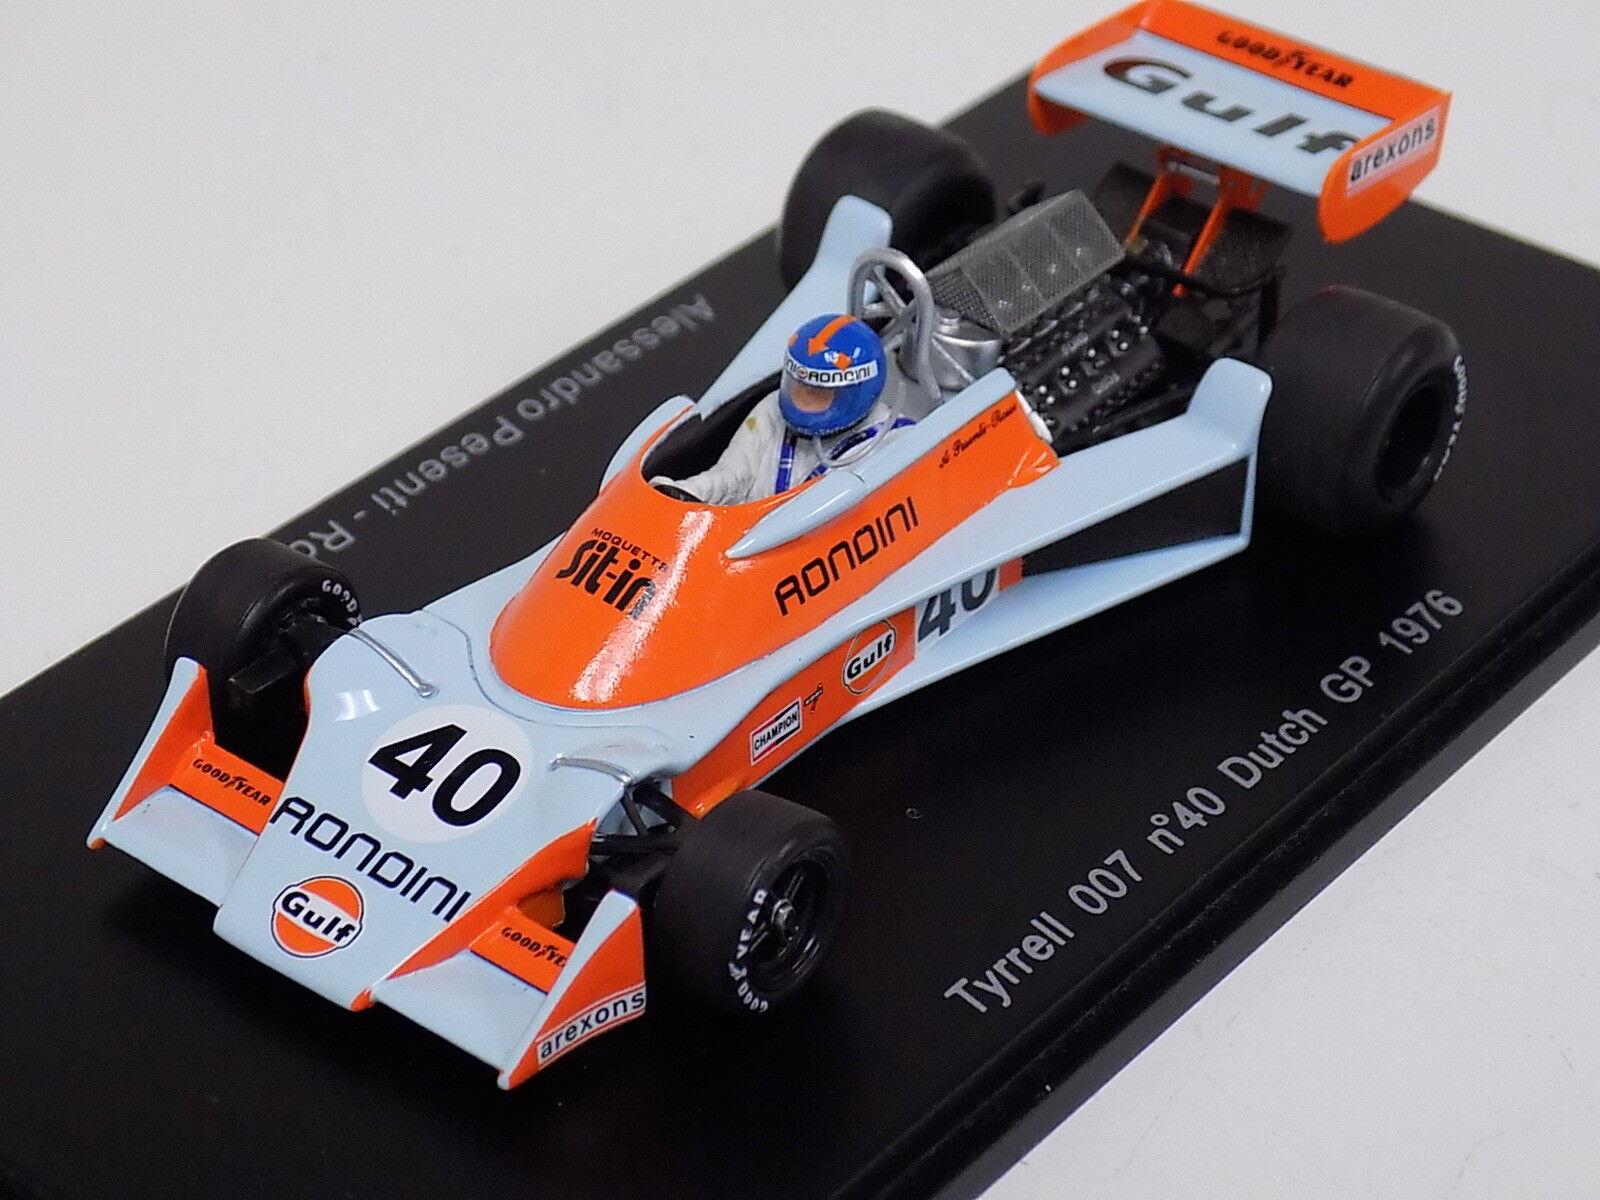 1 43 Spark F1 formule 1 Tyrrell 007 voiture  40 1976 DUTCH Grand Prix A.P. Rossi RO S1648